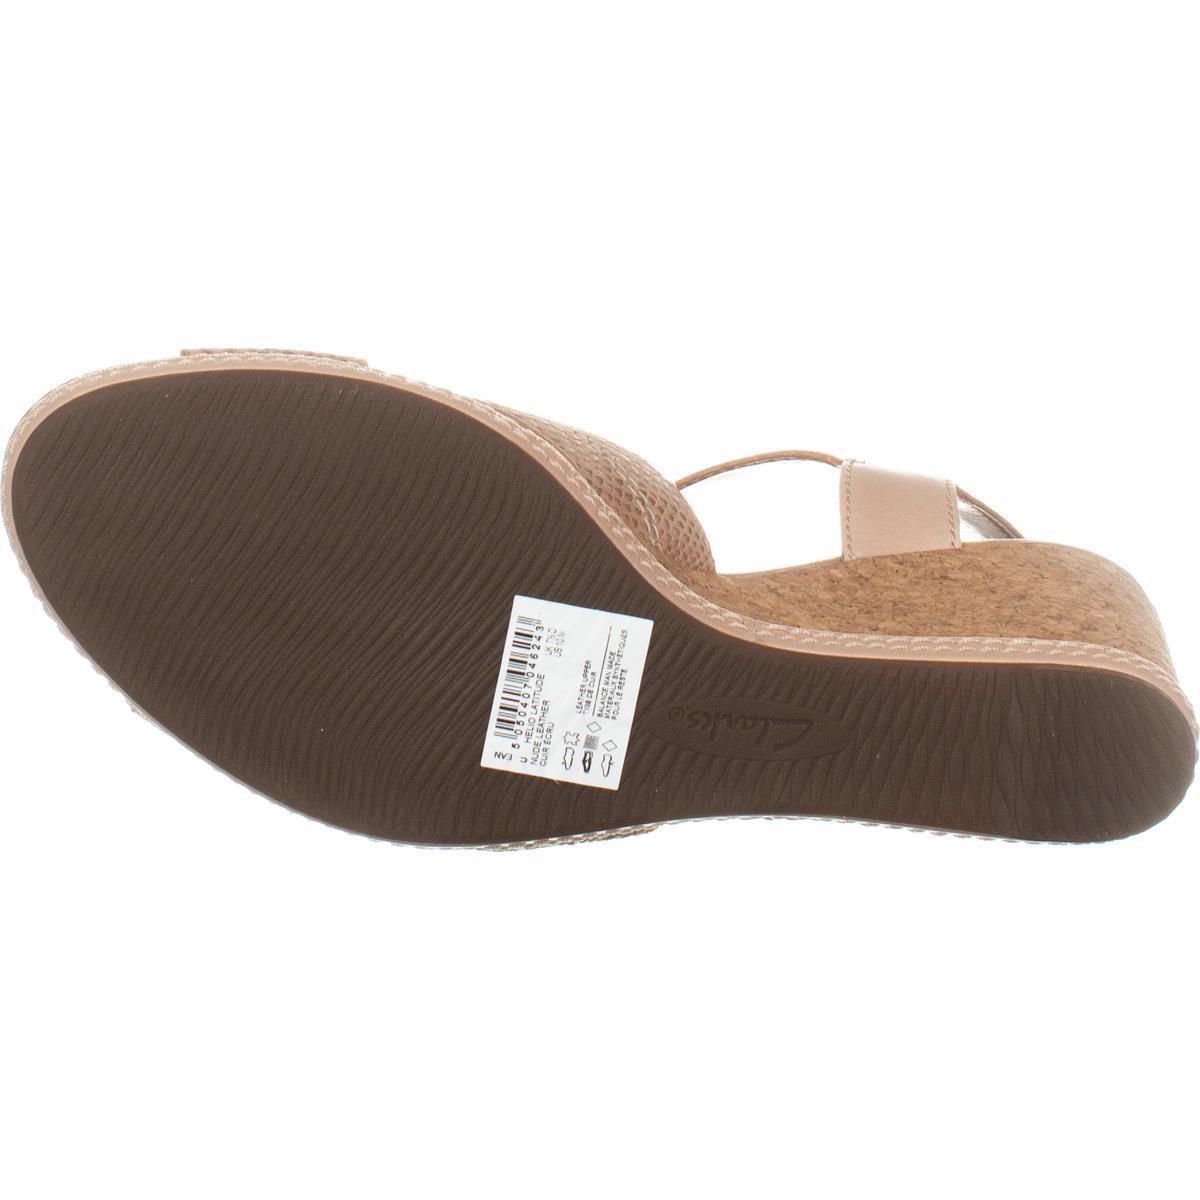 ad20aefe043 Lyst - Clarks Helio Latitude Comfort Wedge Sandals in Natural